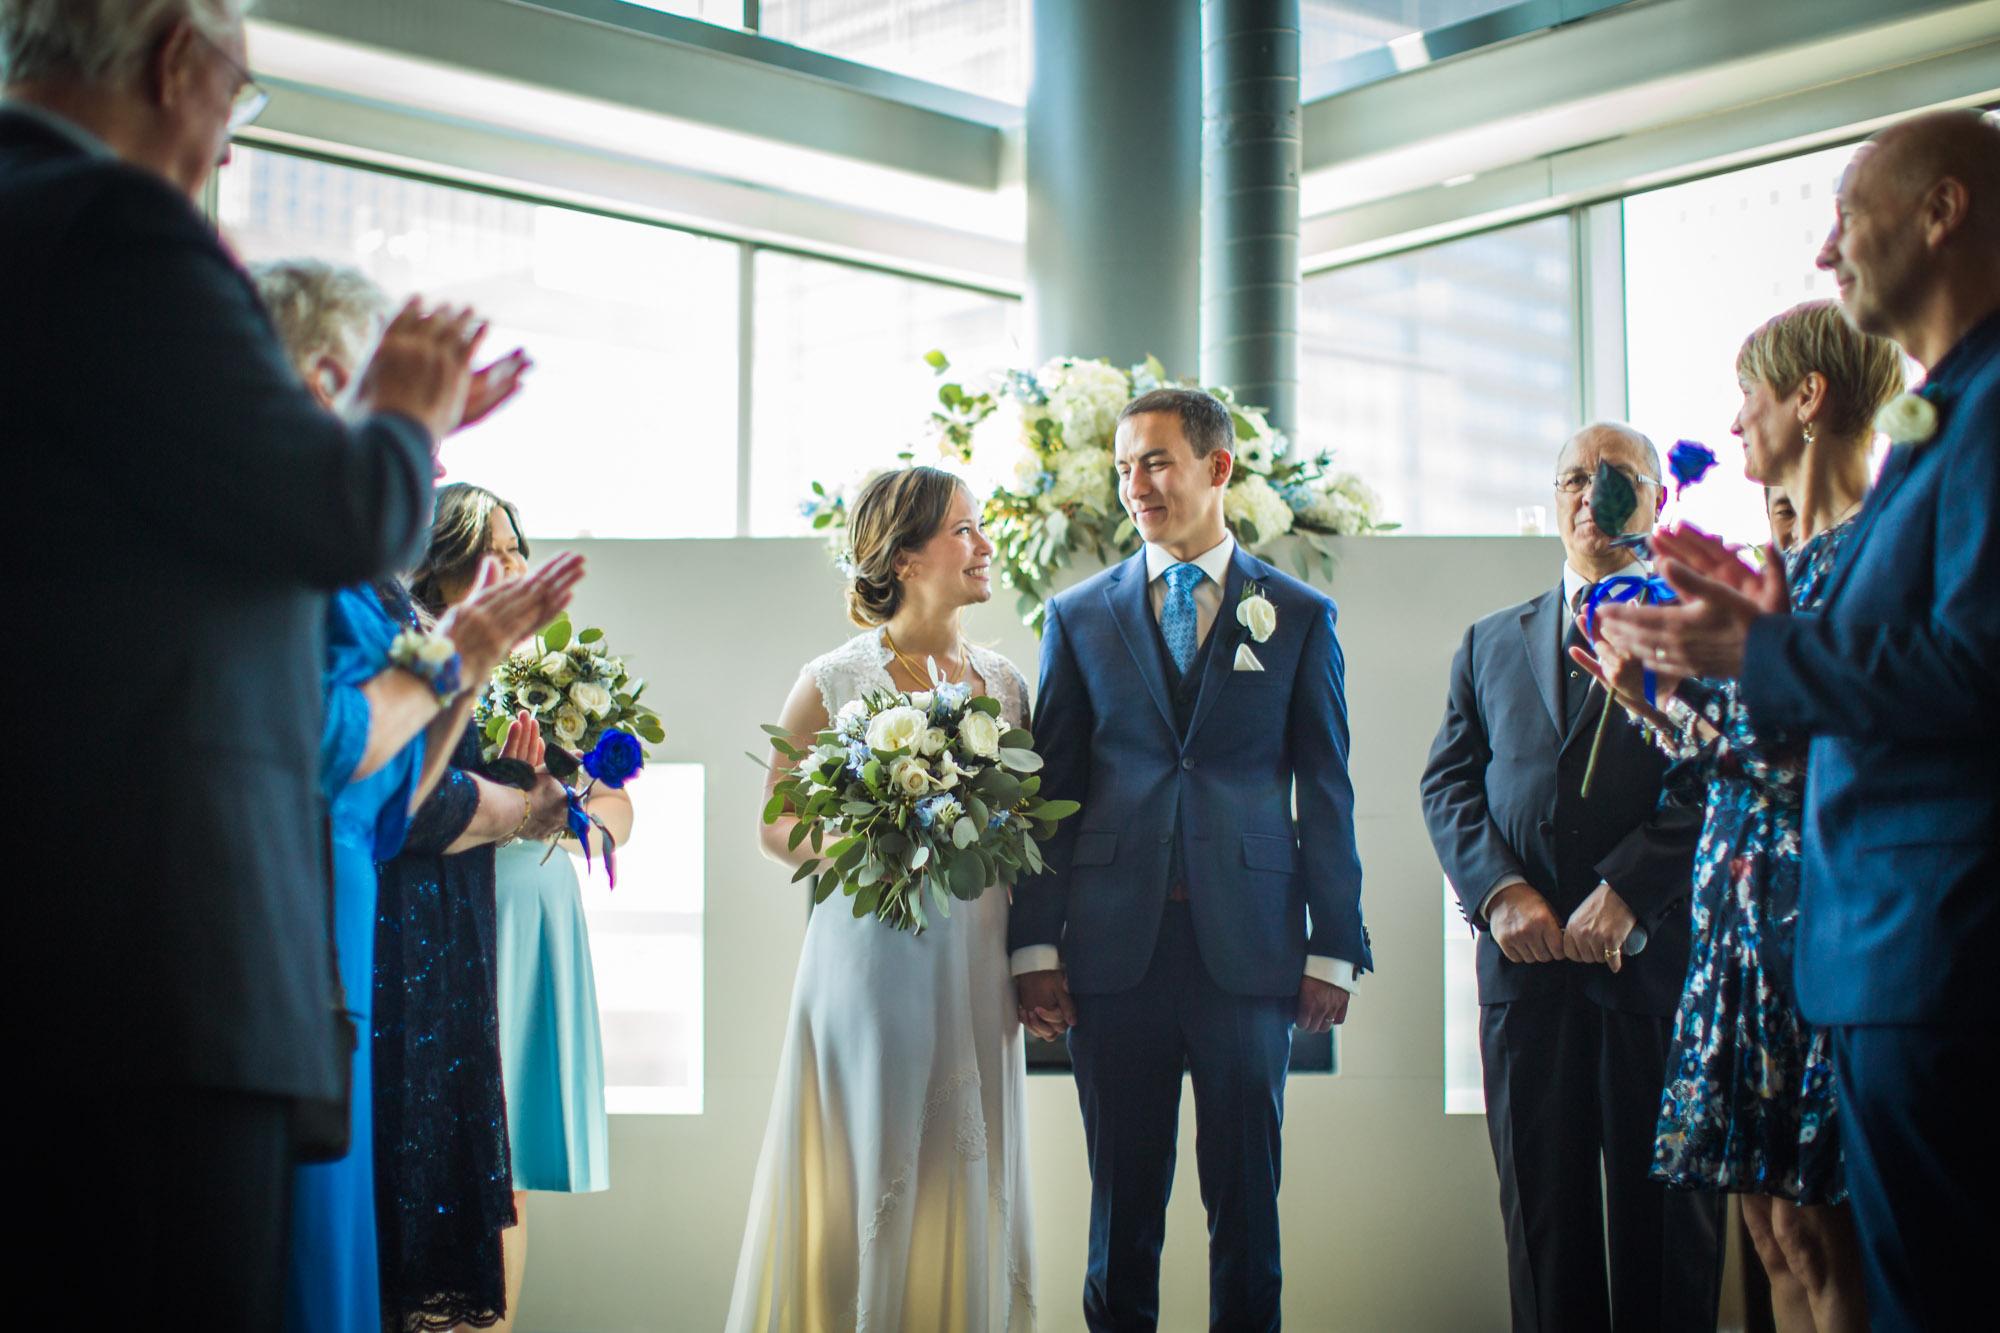 lam-chicago-wedding-photos-20.jpg